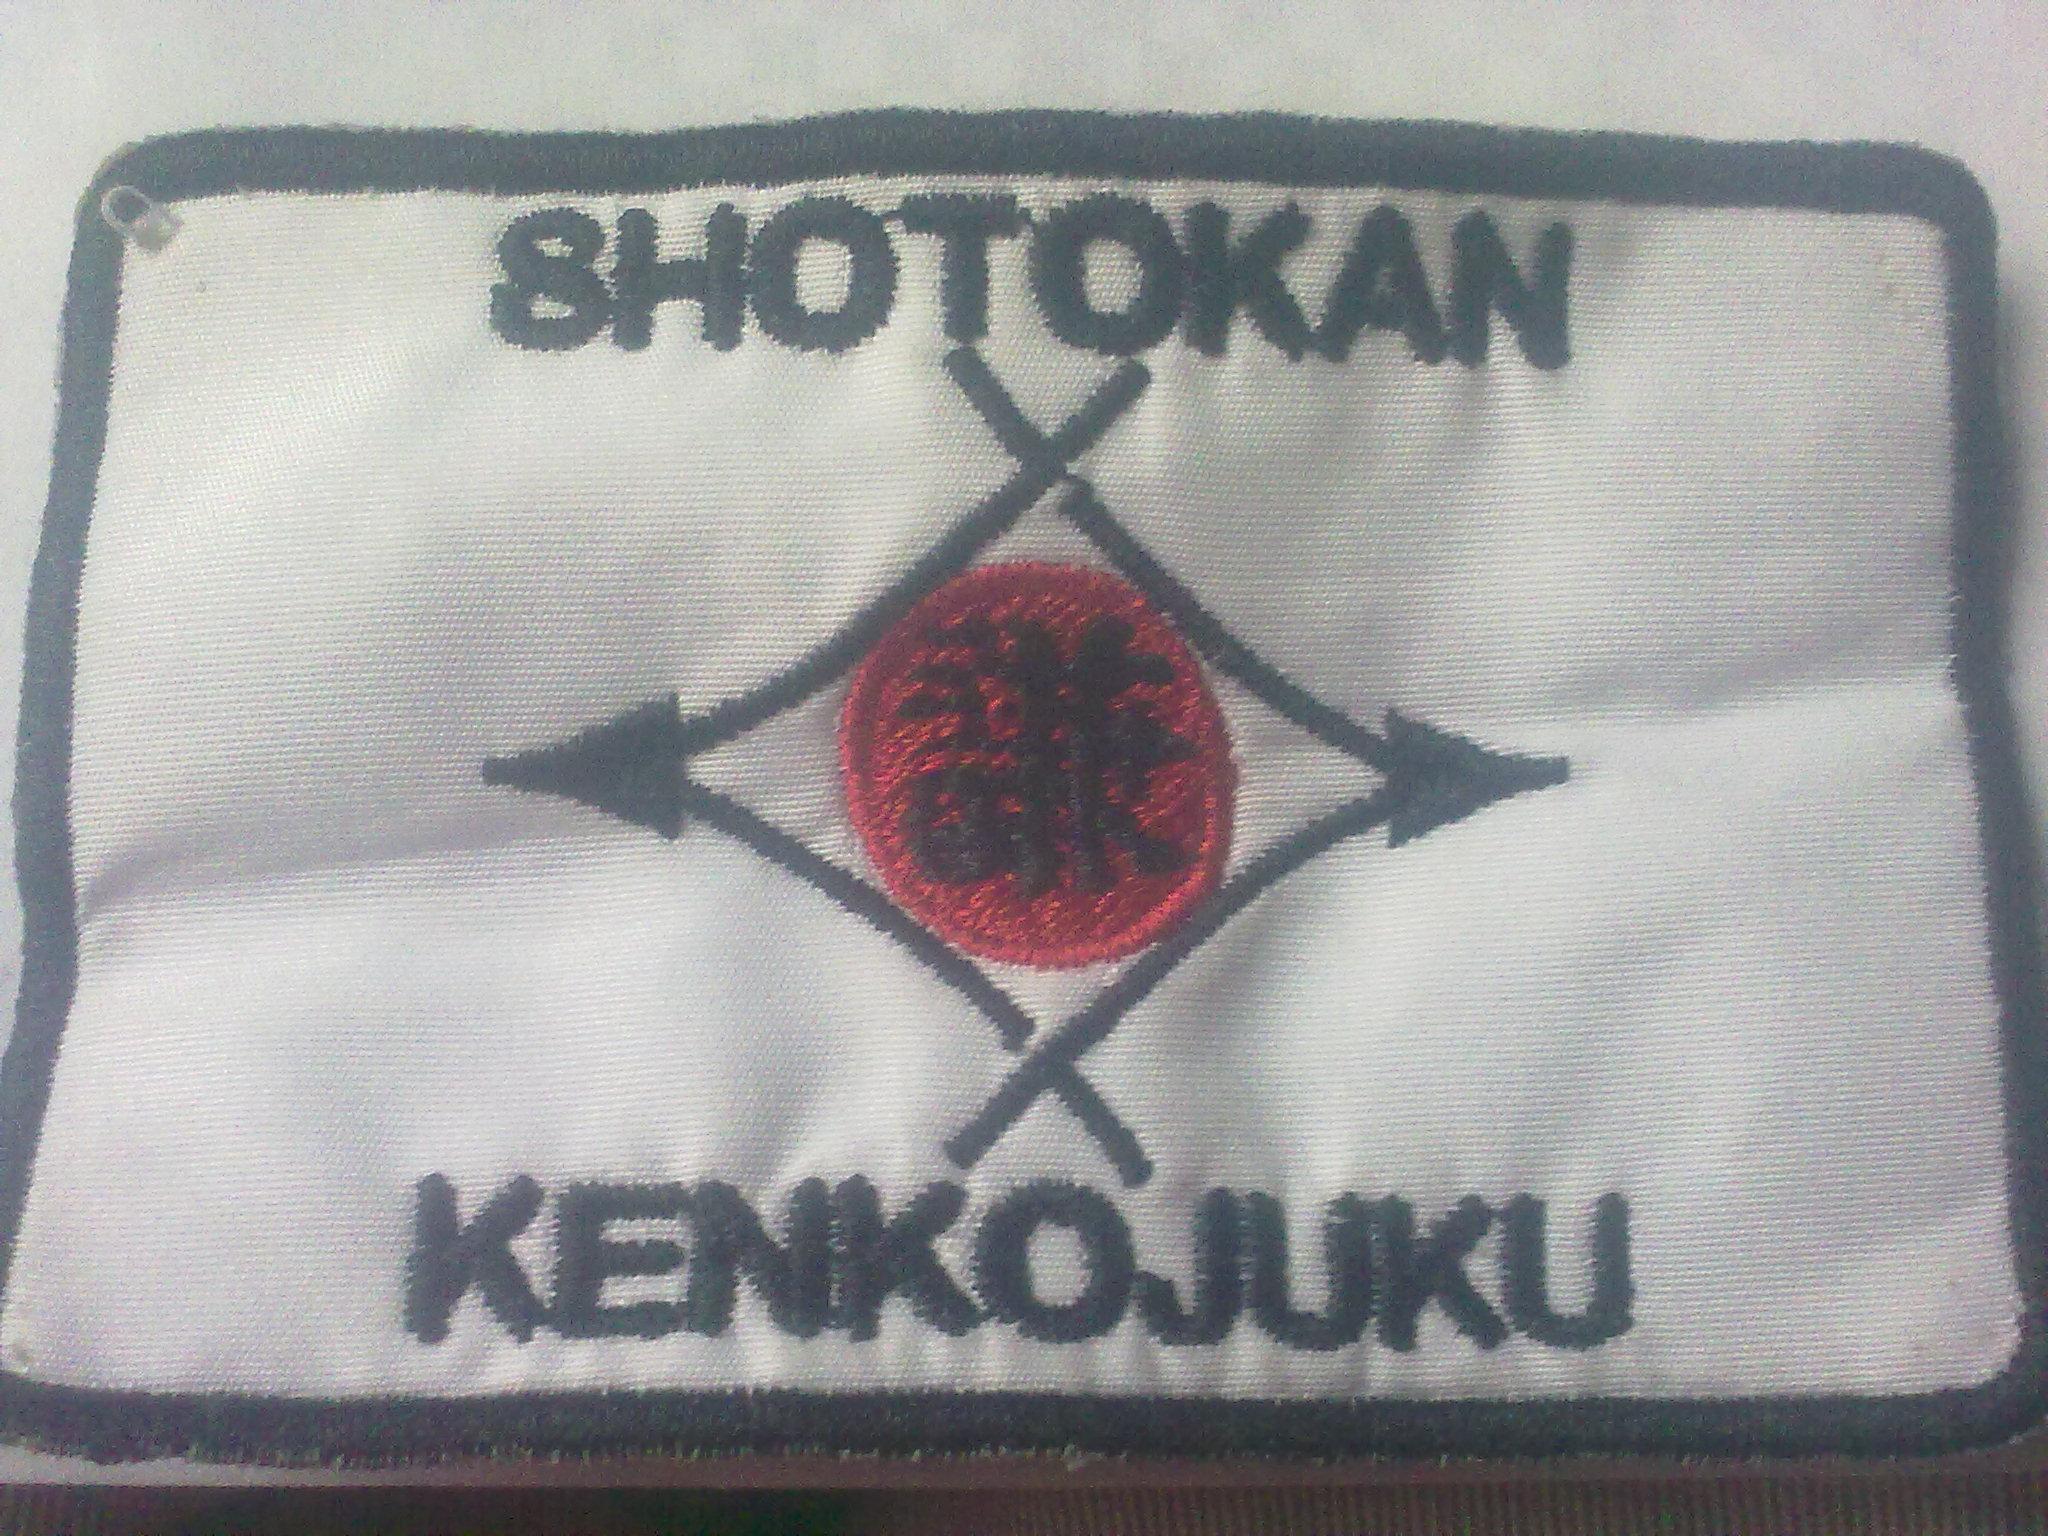 Archivokarate Shotokan Kenkojuku Kyu Patchjpg Wikipedia